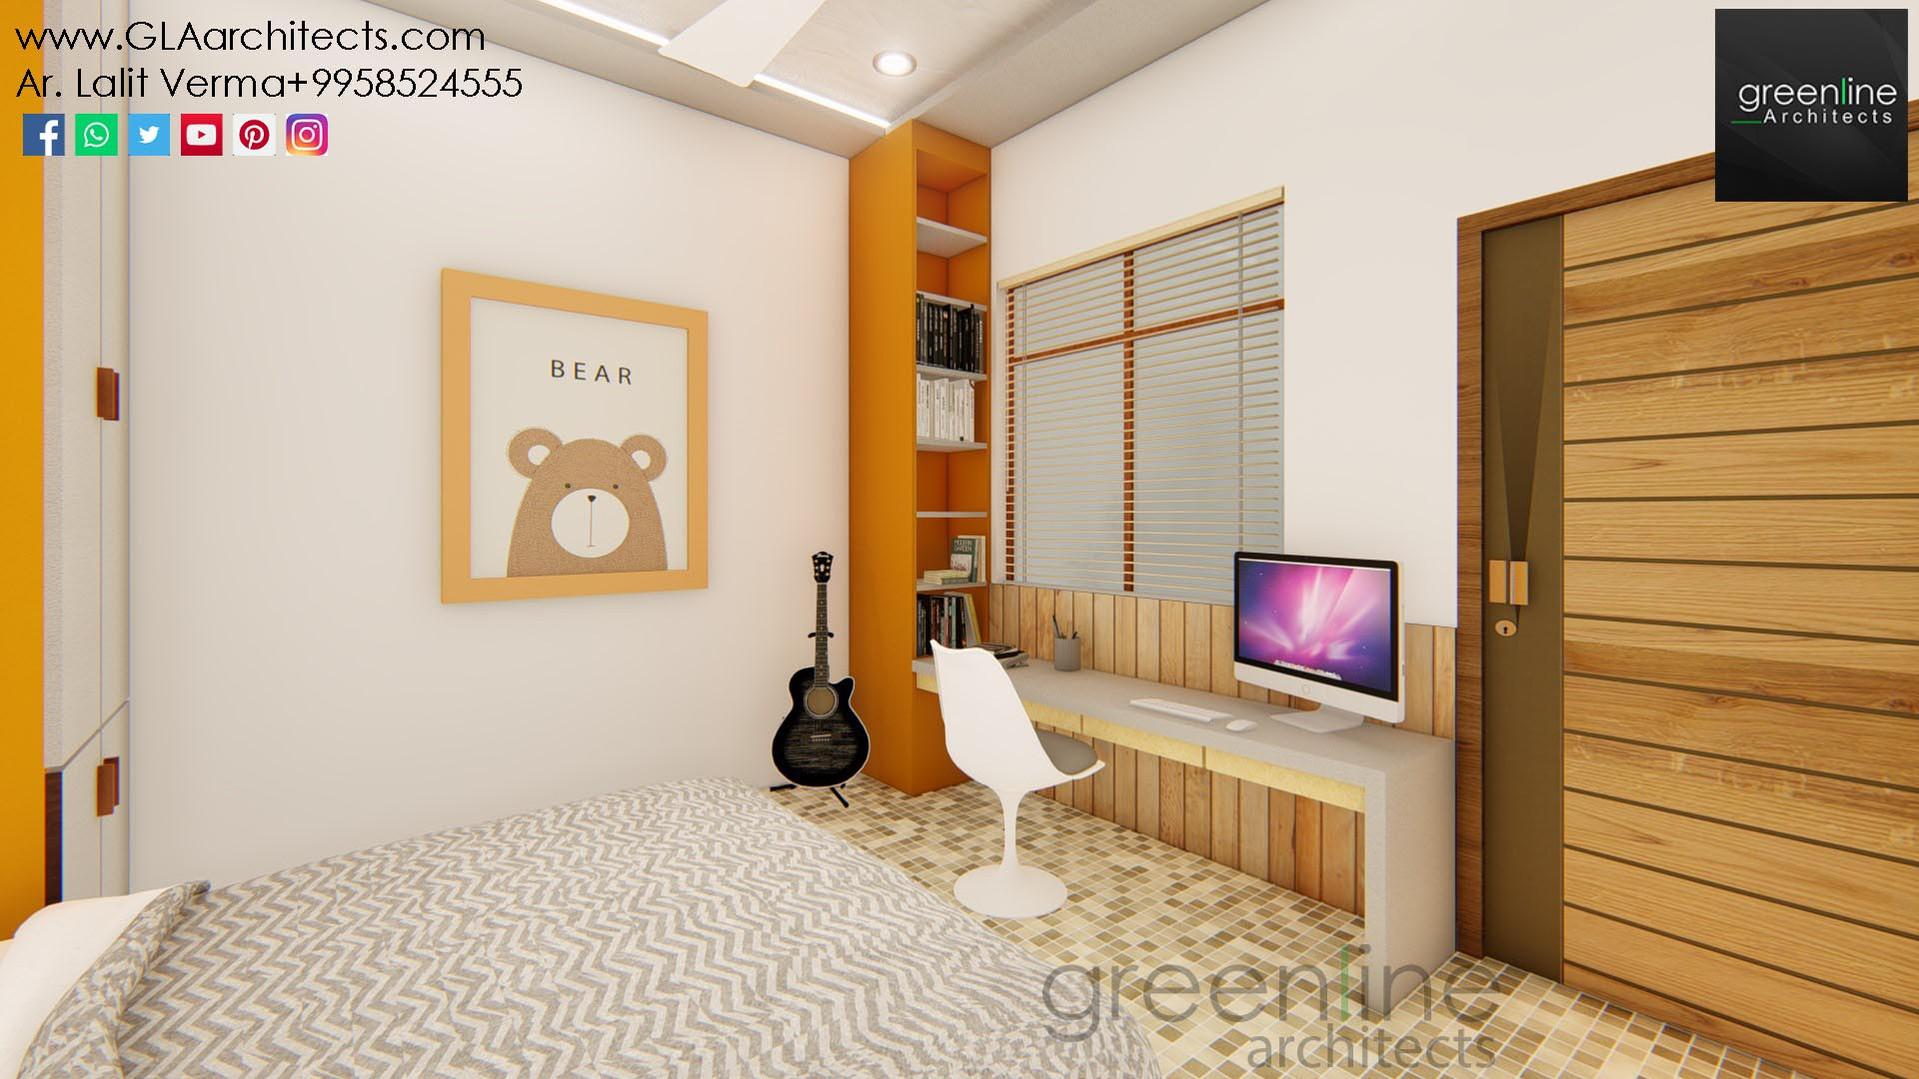 3 BHK-Apartment_Home Interior (14).jpg